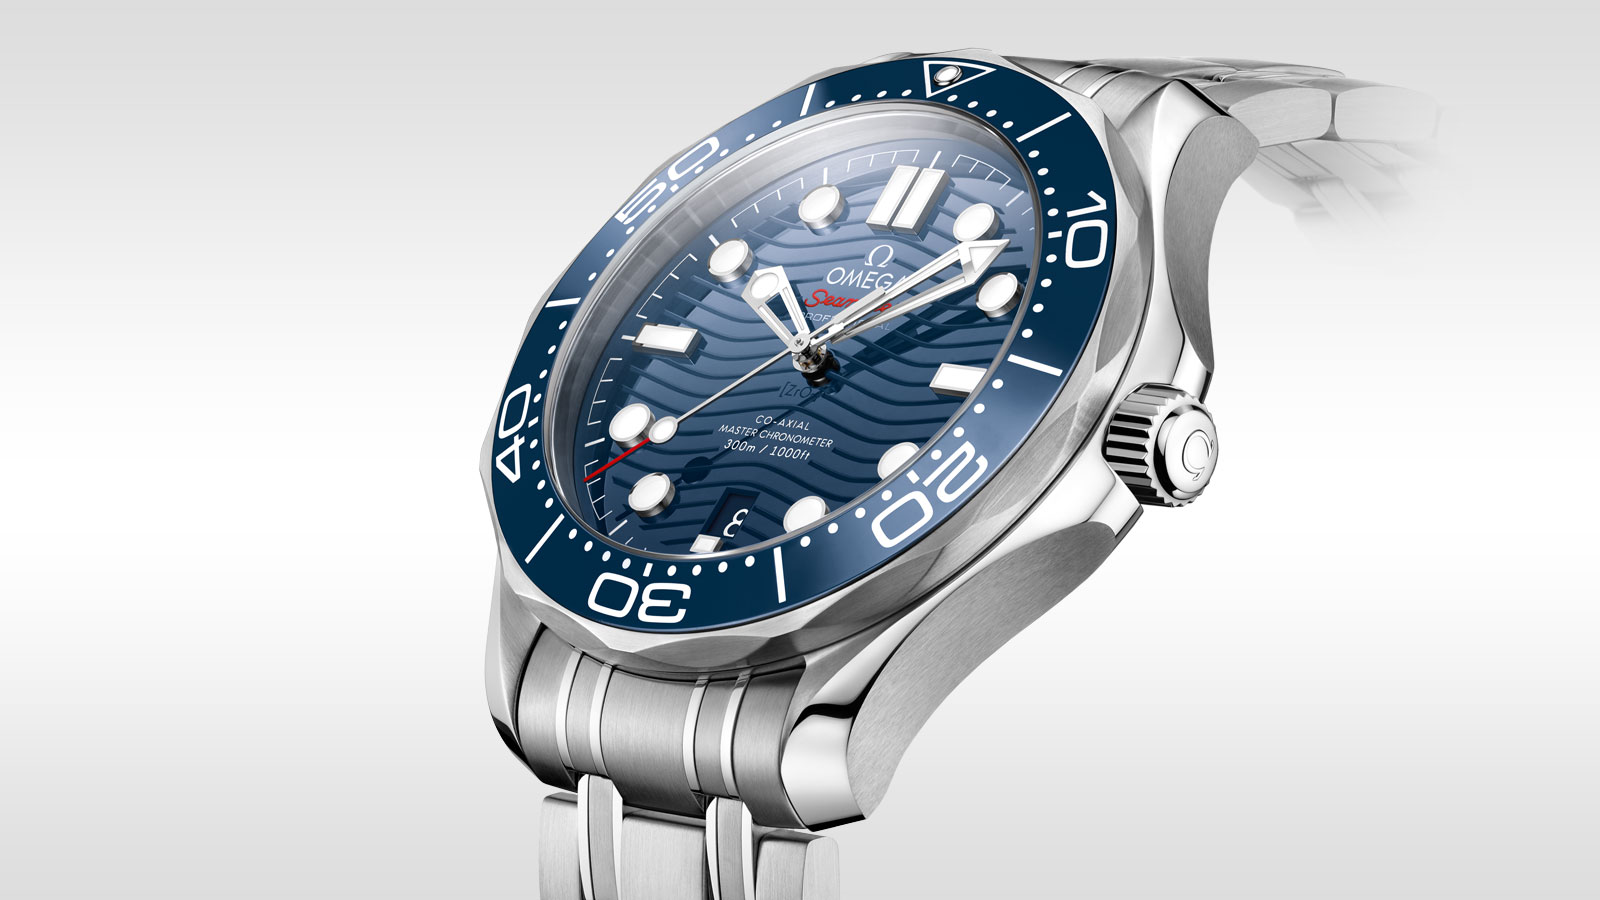 Seamaster 300米潜水表 300米潜水表 欧米茄同轴•至臻天文台表42毫米 - 210.30.42.20.03.001 - 查看 3